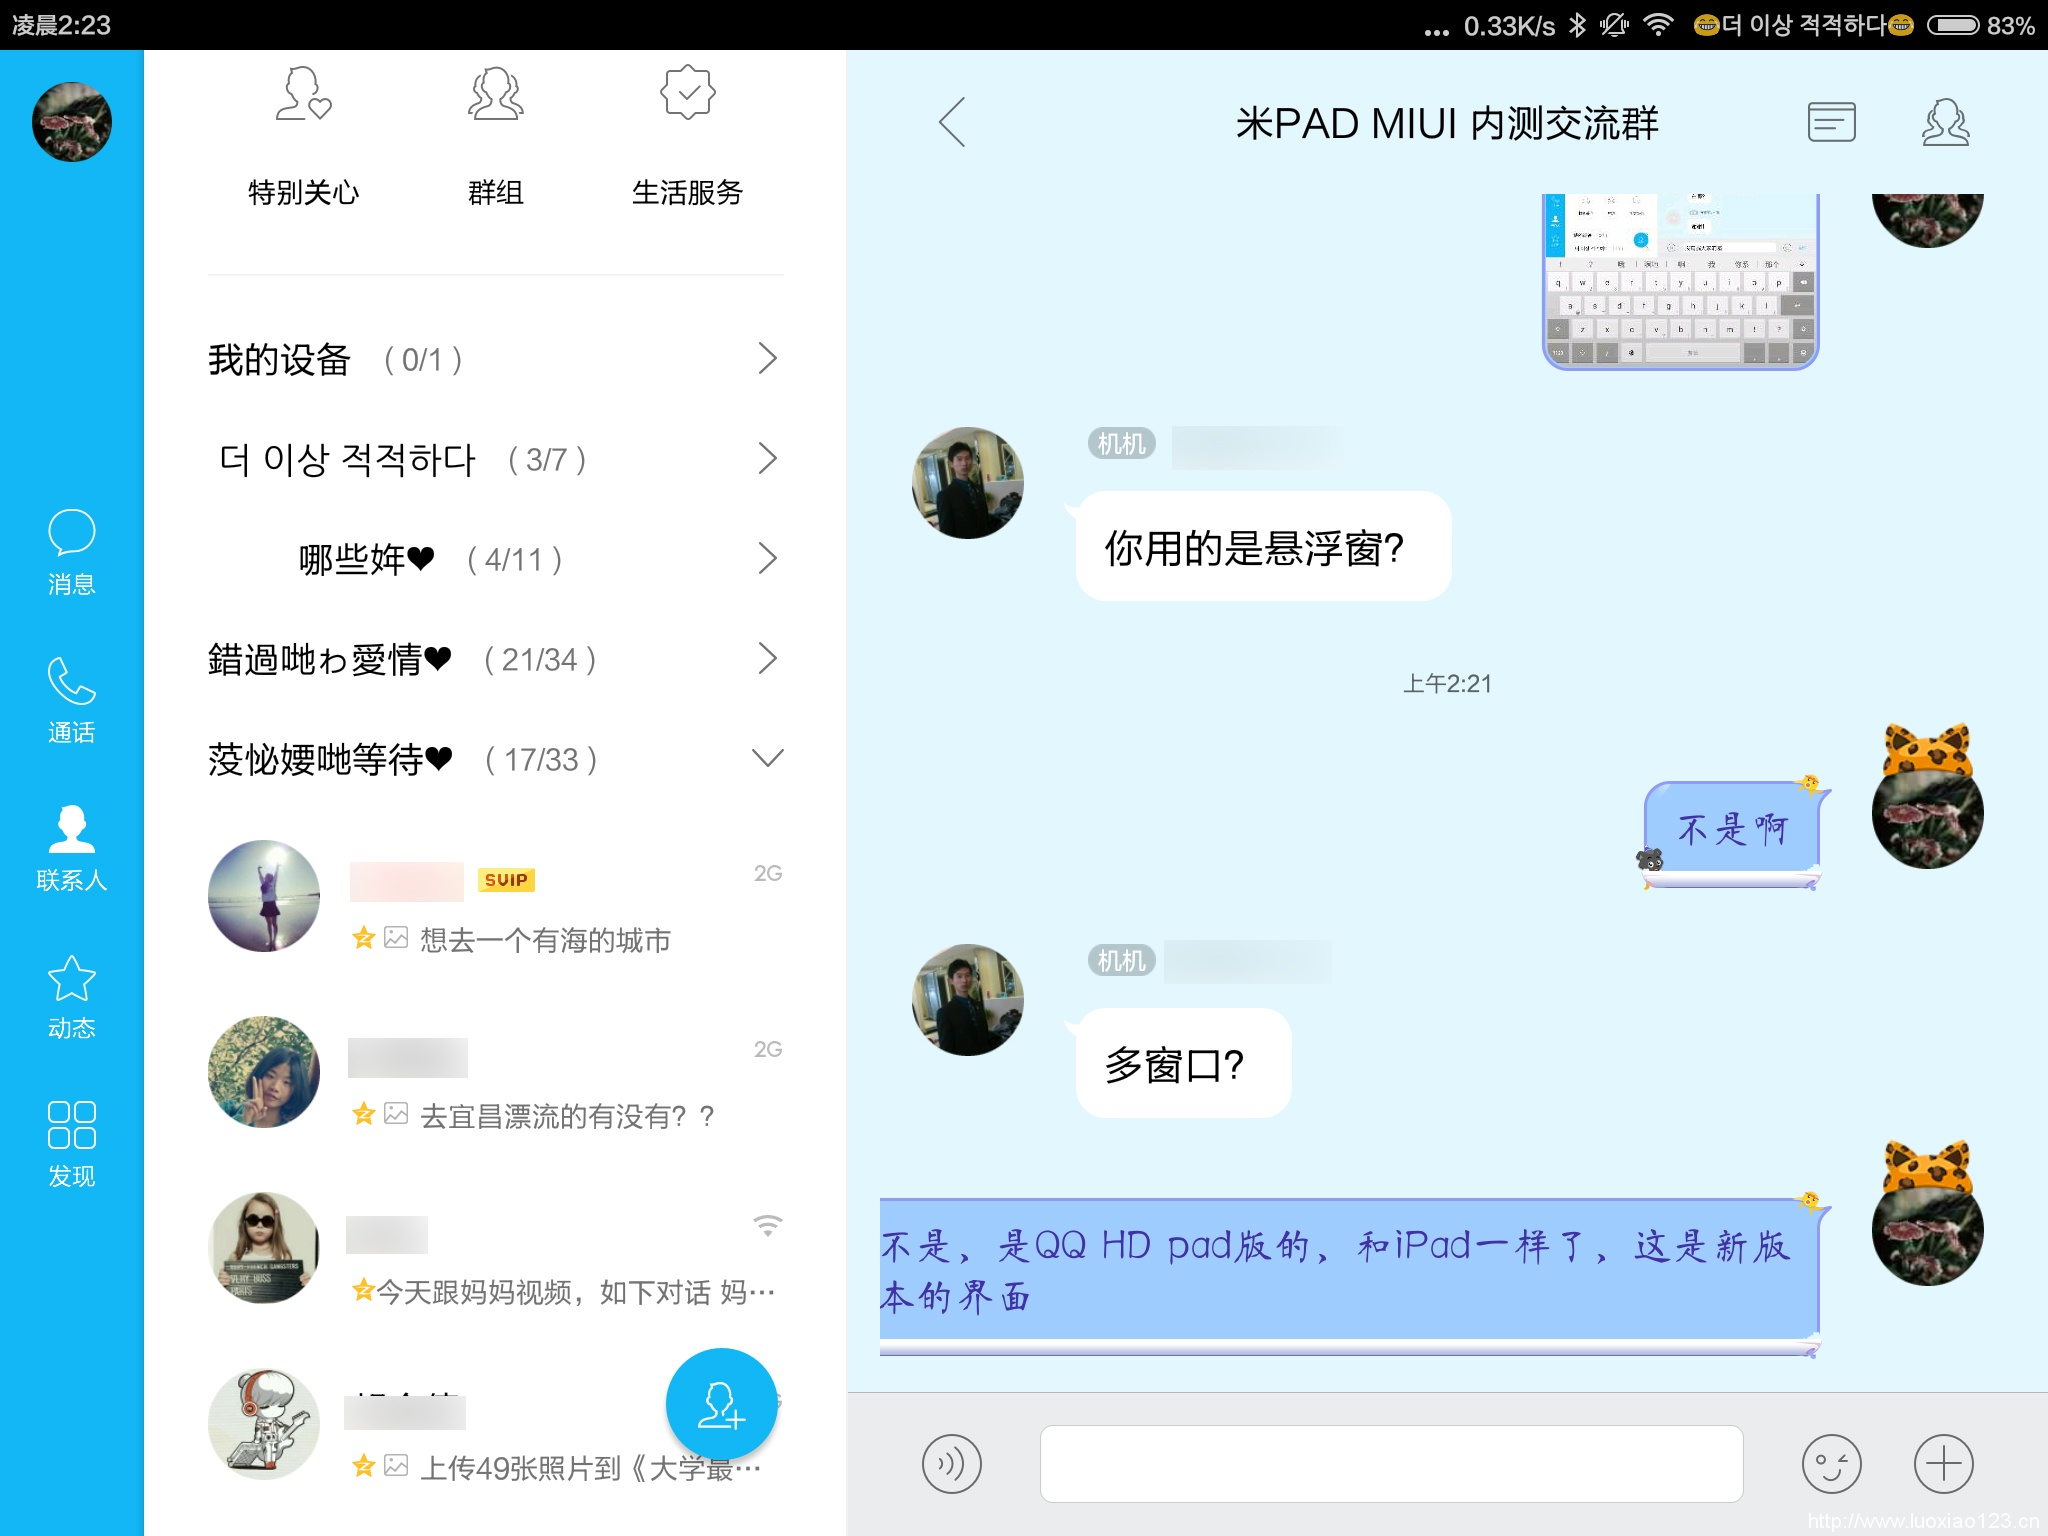 诈尸级更新---QQHD for Android 2015 V5.5.0免费下载 小米平板pad完美可用